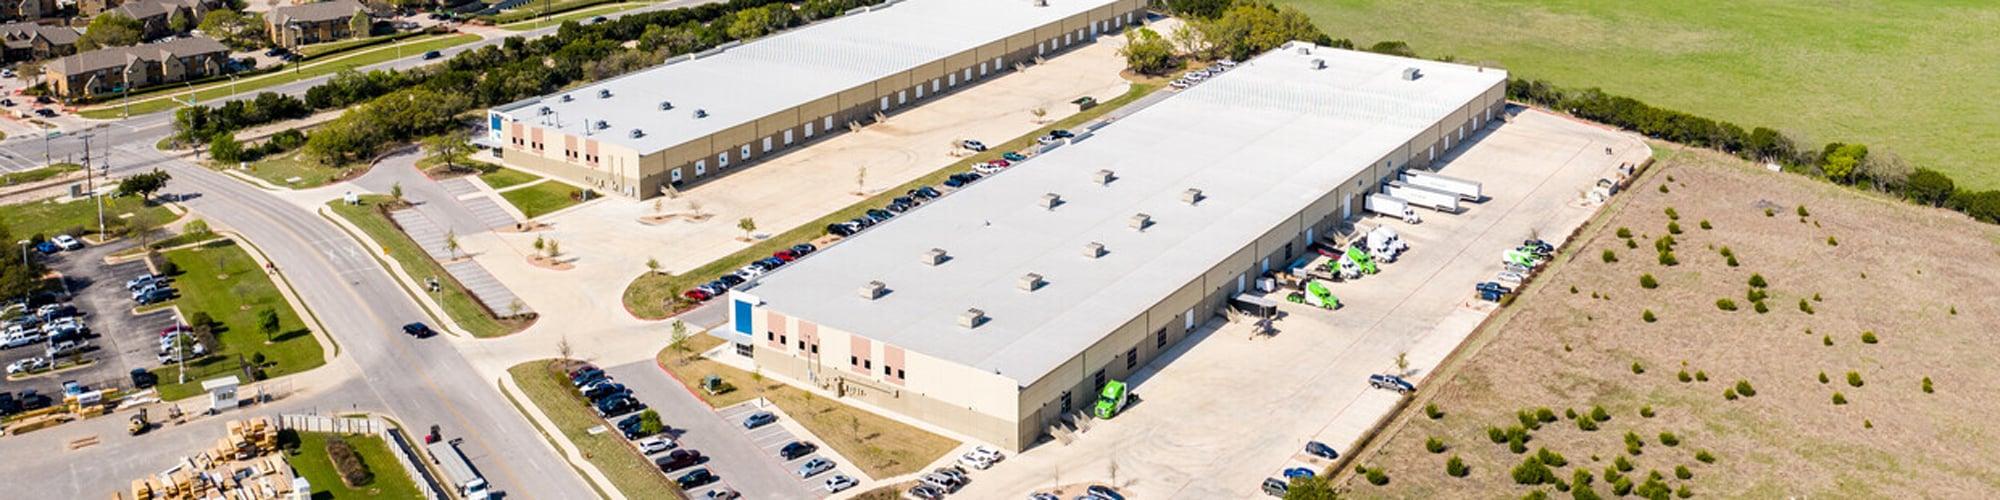 Brushy Creek Corporate Center - 1200 BMC Drive - Exterior